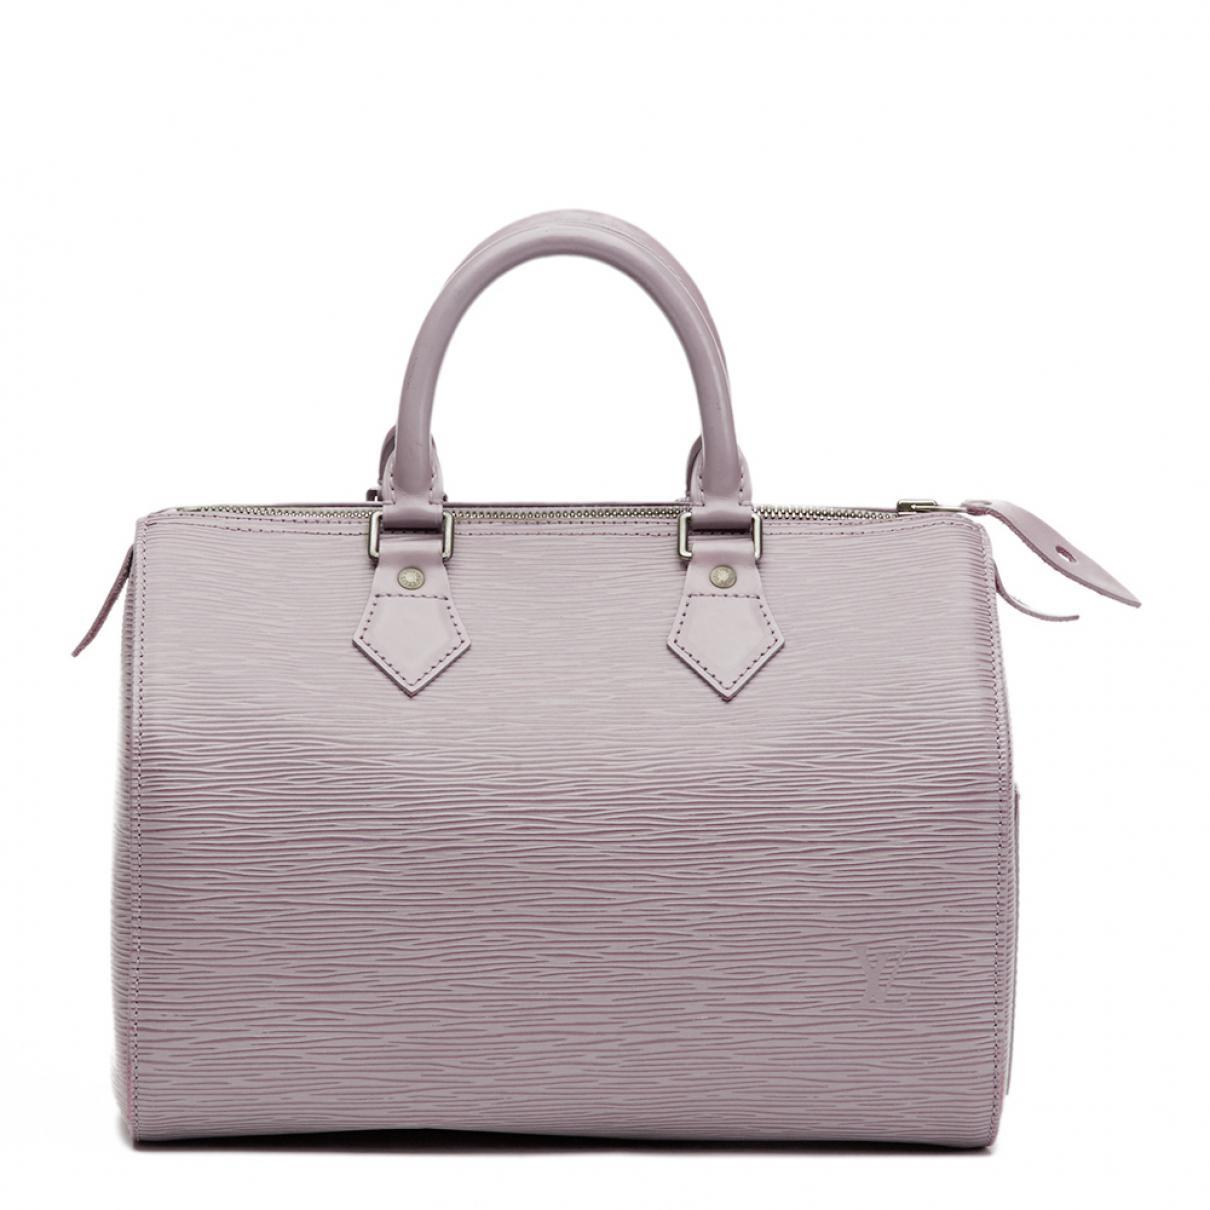 Pre-owned - Speedy leather handbag Louis Vuitton ehsiP